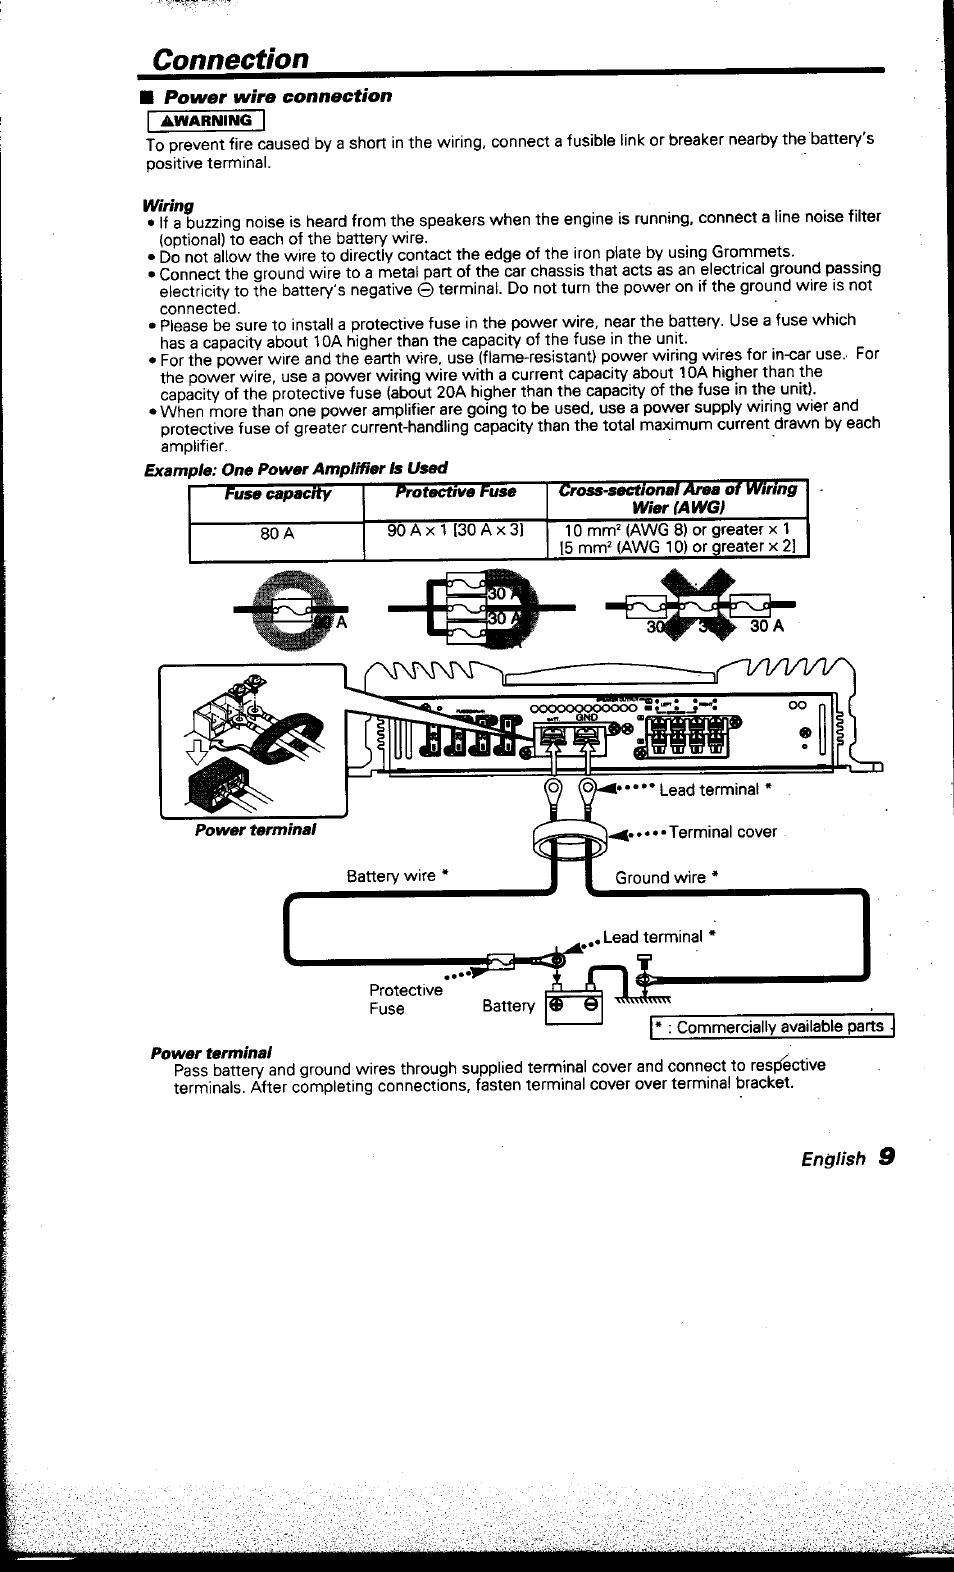 connection kenwood kac x501f user manual page 9 15 rh manualsdir com